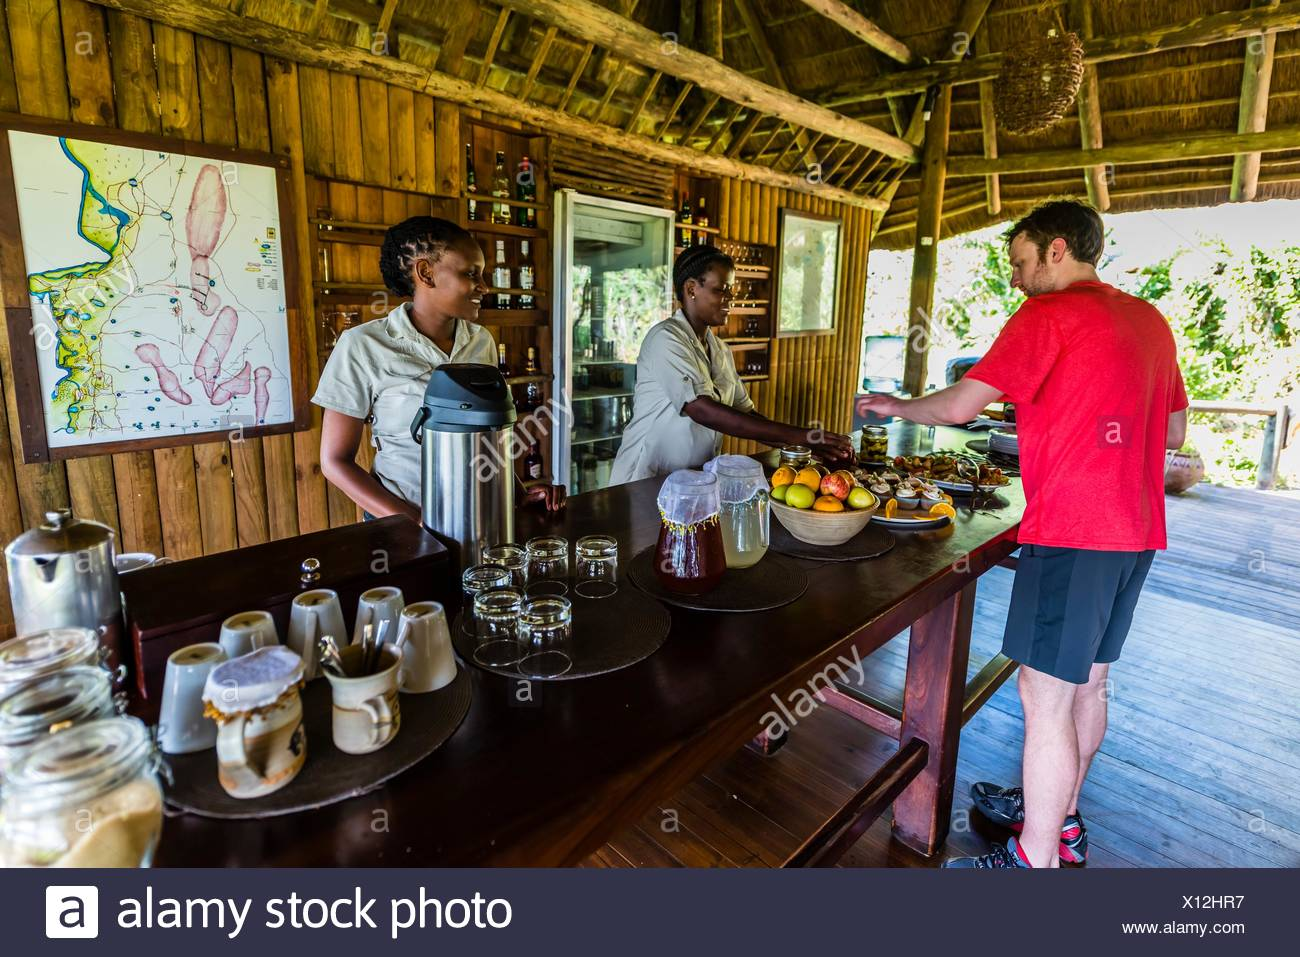 Lebala Camp, Kwando Concession, Linyanti Marshes, Botswana. Stock Photo